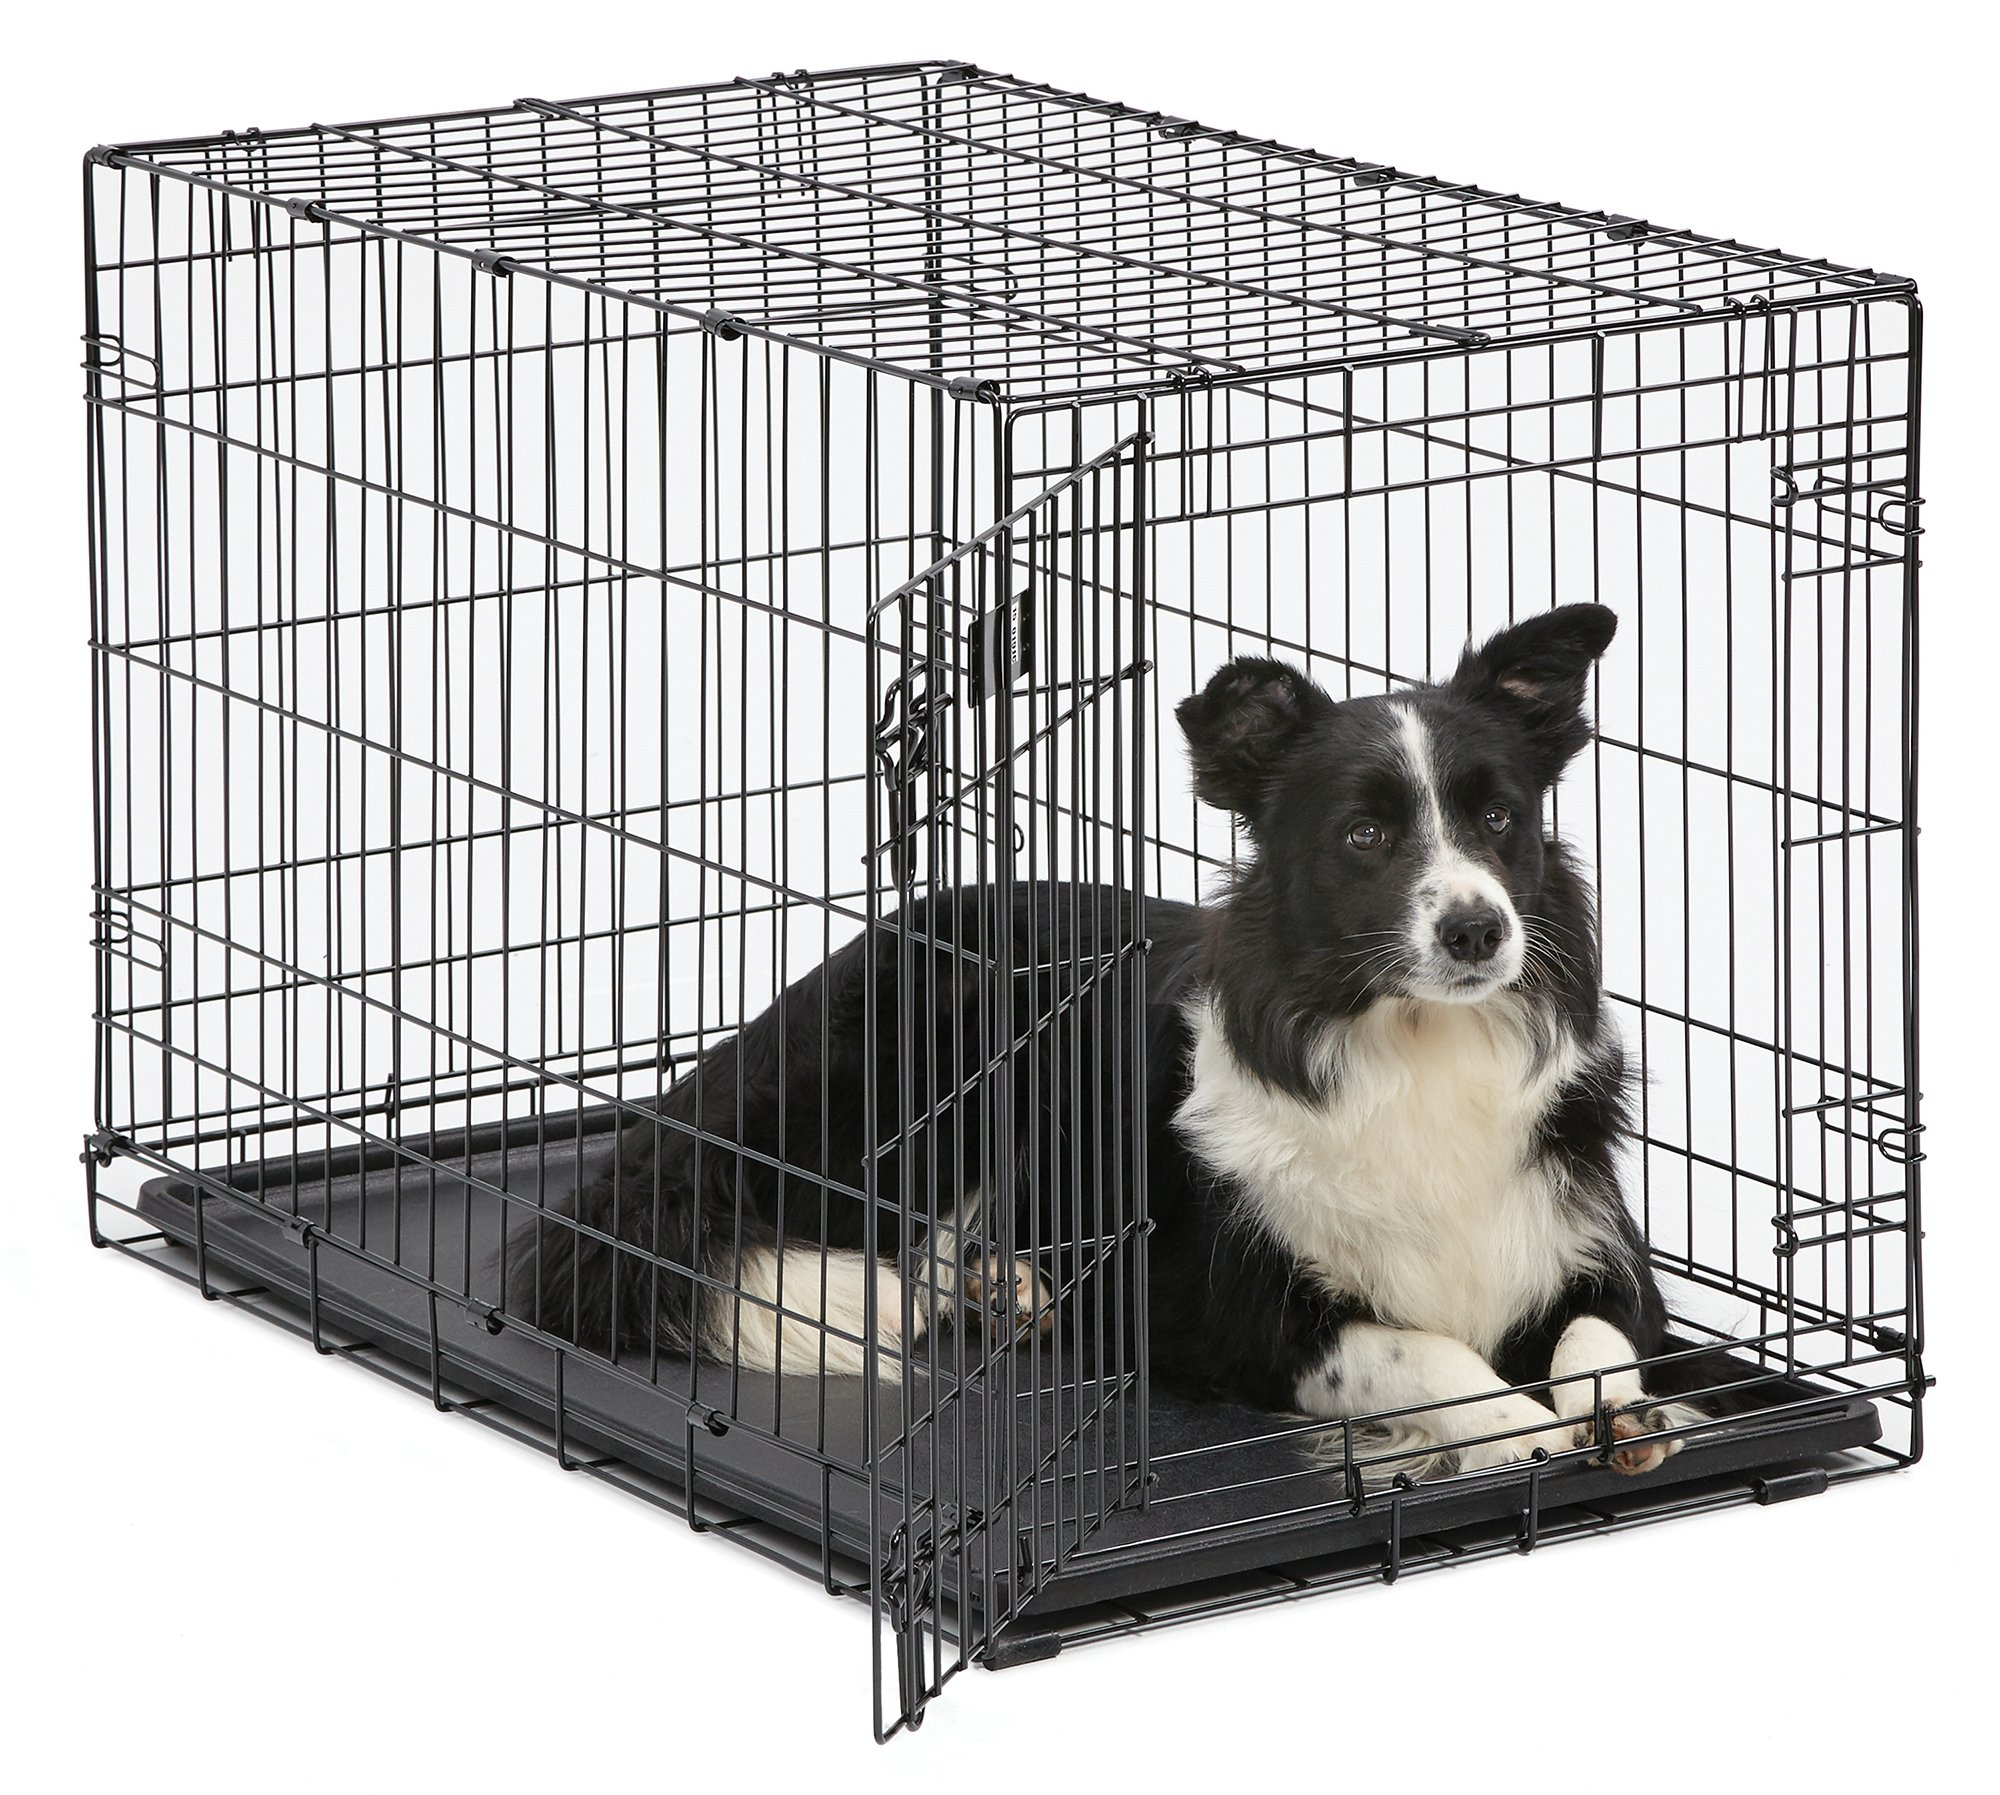 Best rated in pet supplies helpful customer reviews amazon midwest homes for pets dog crate icrate single door double door folding metal dog solutioingenieria Images